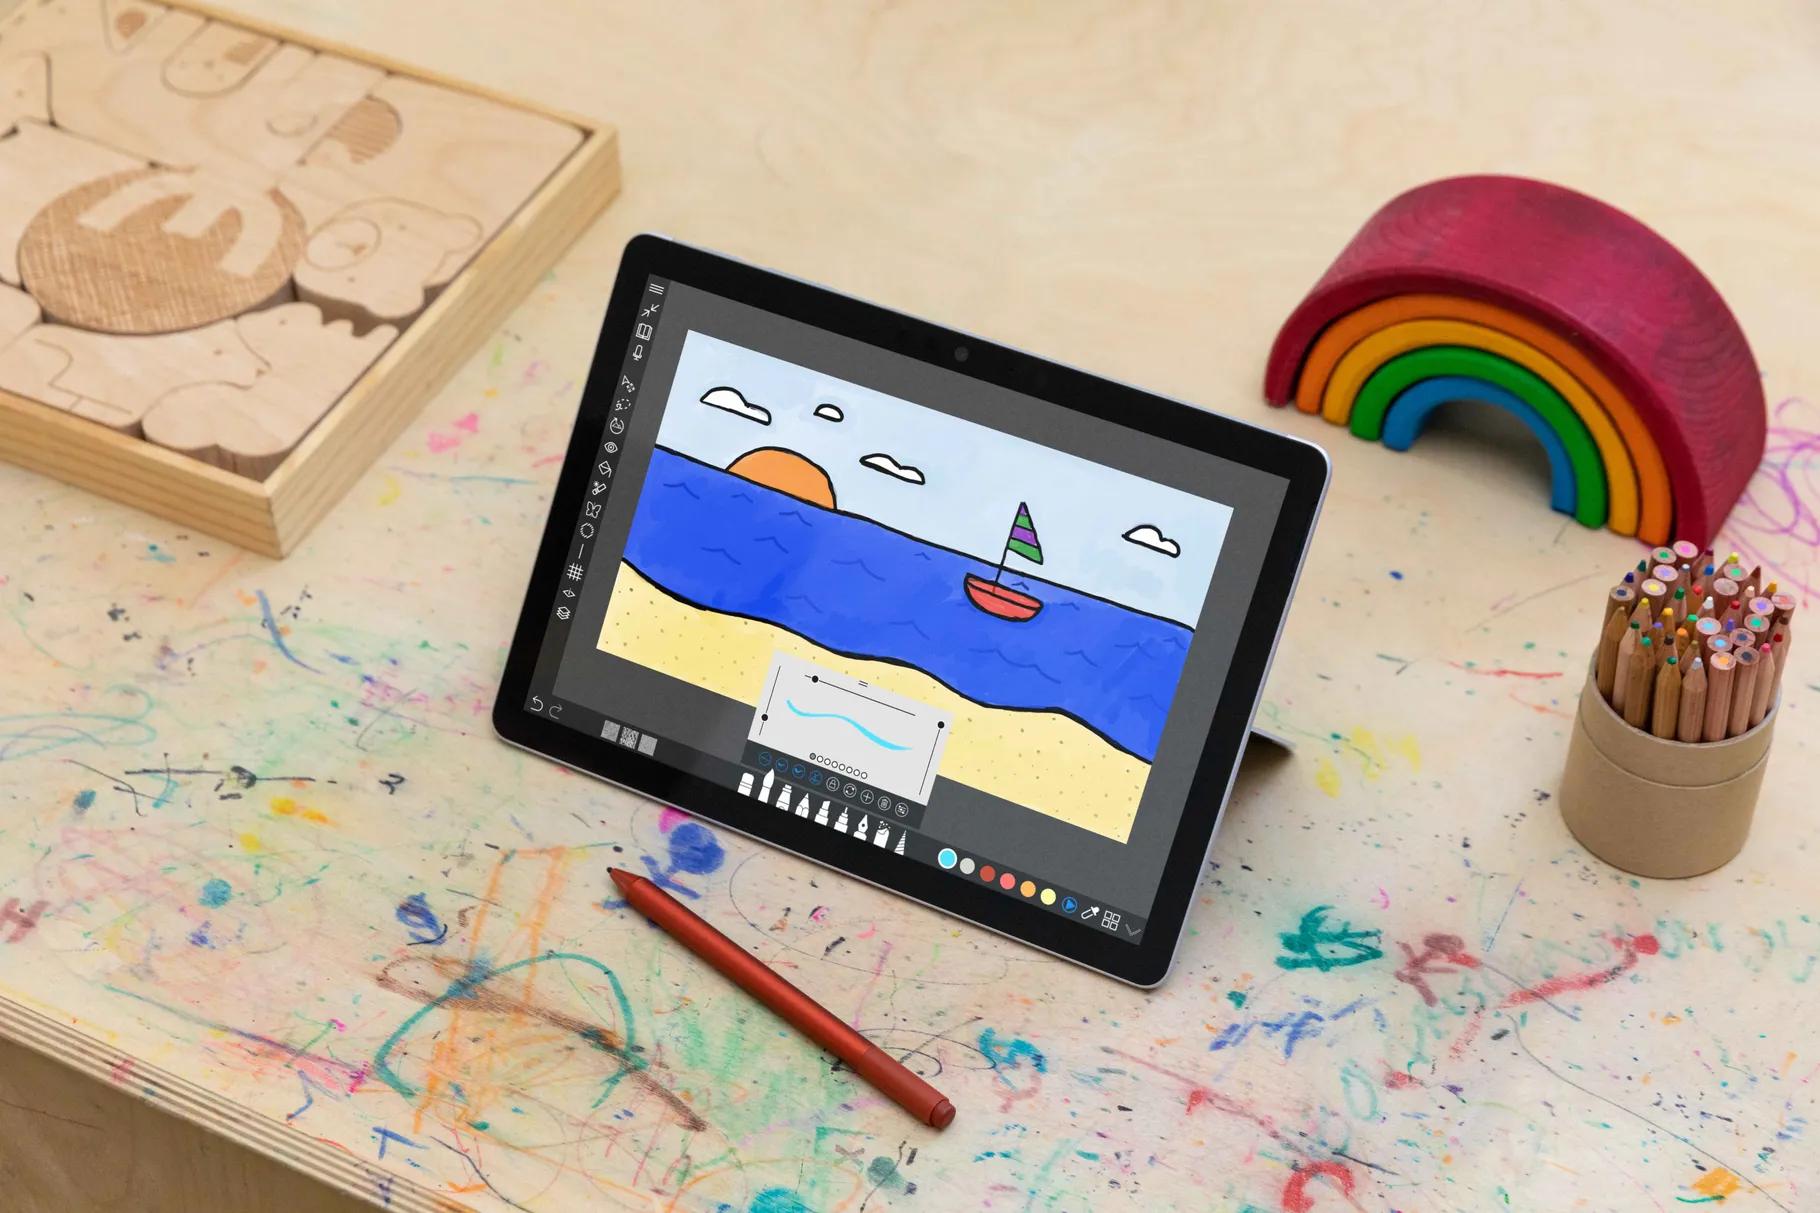 Surface_Go_3_Creating_laptopvang (1)